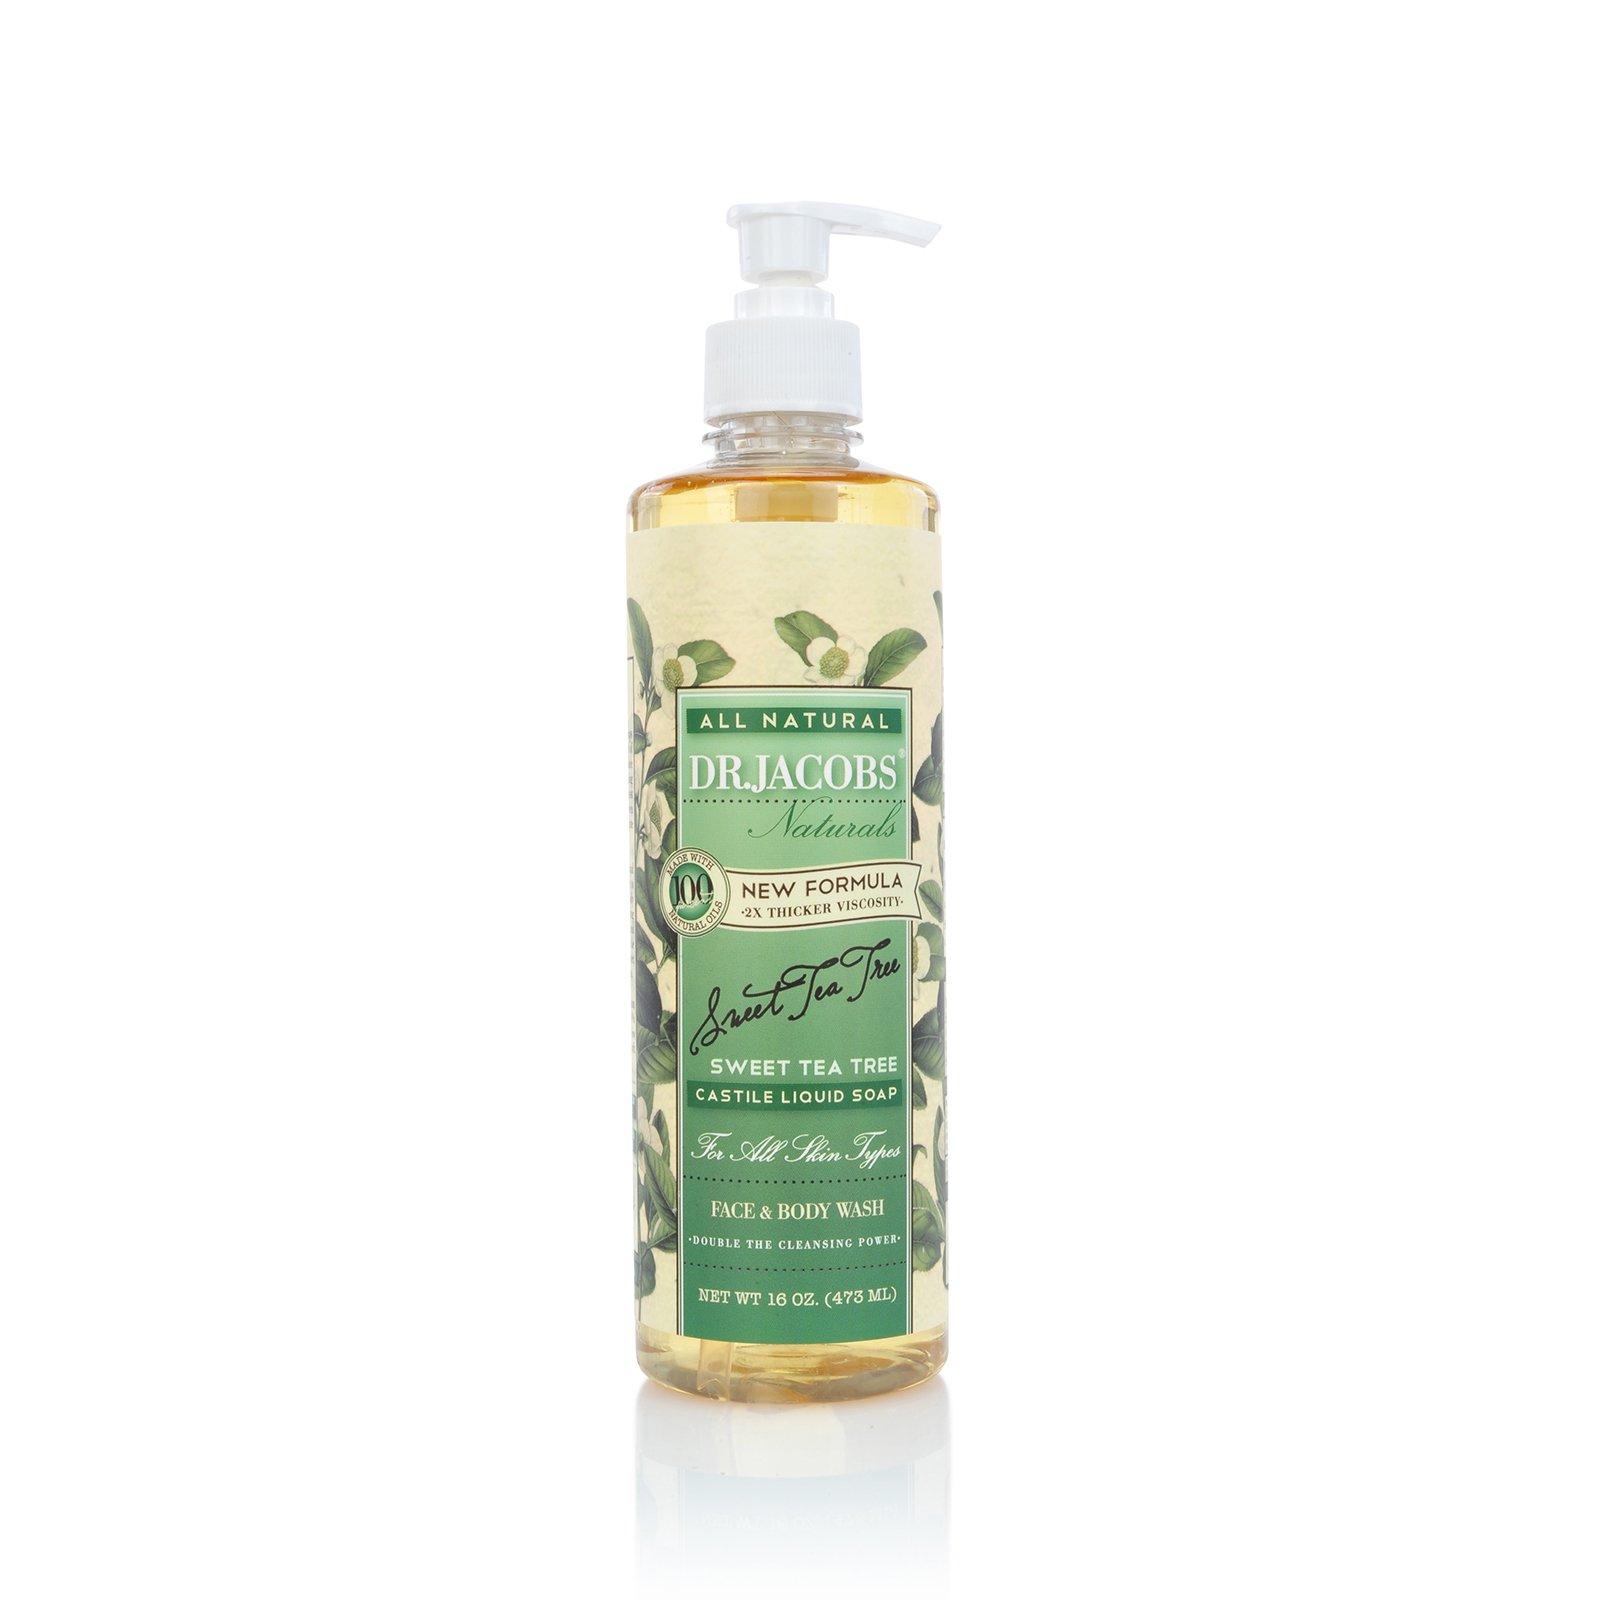 DR.JACOBS NATURALS Pure Castile Liquid Soap - Natural Face and Body Wash 16 oz. (Sweet Tea Tree)